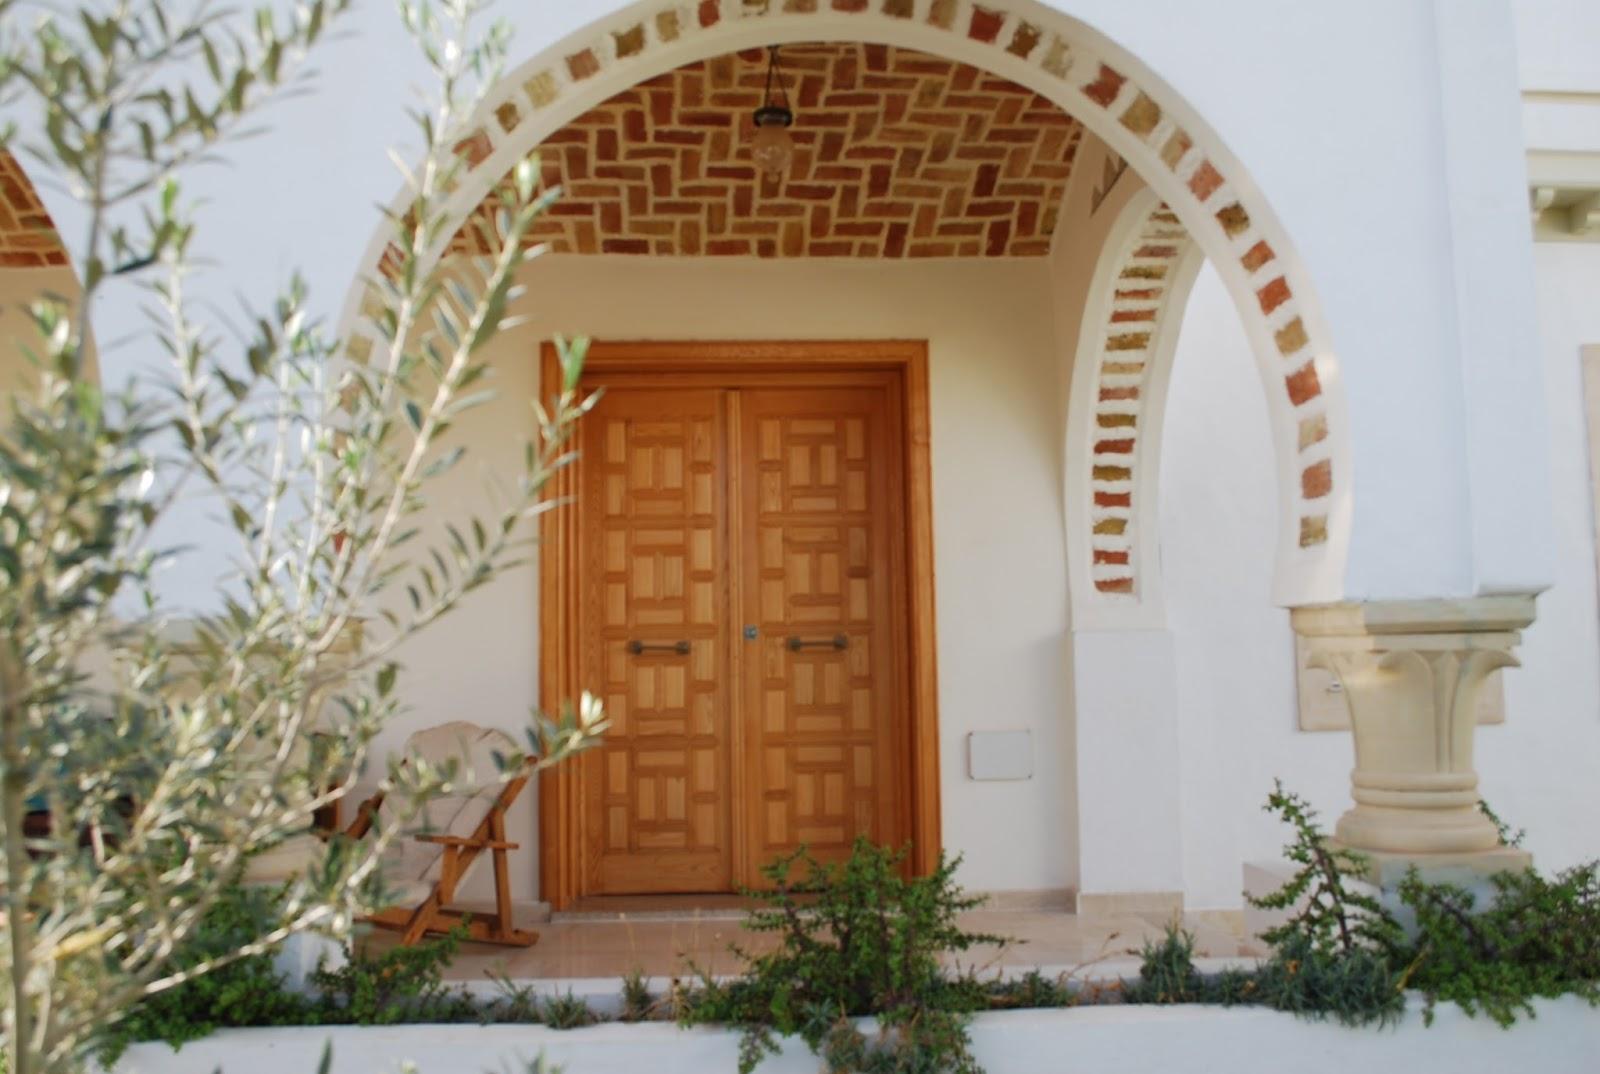 Facade de maison moderne en tunisie for Decoration maison 2019 tunisie